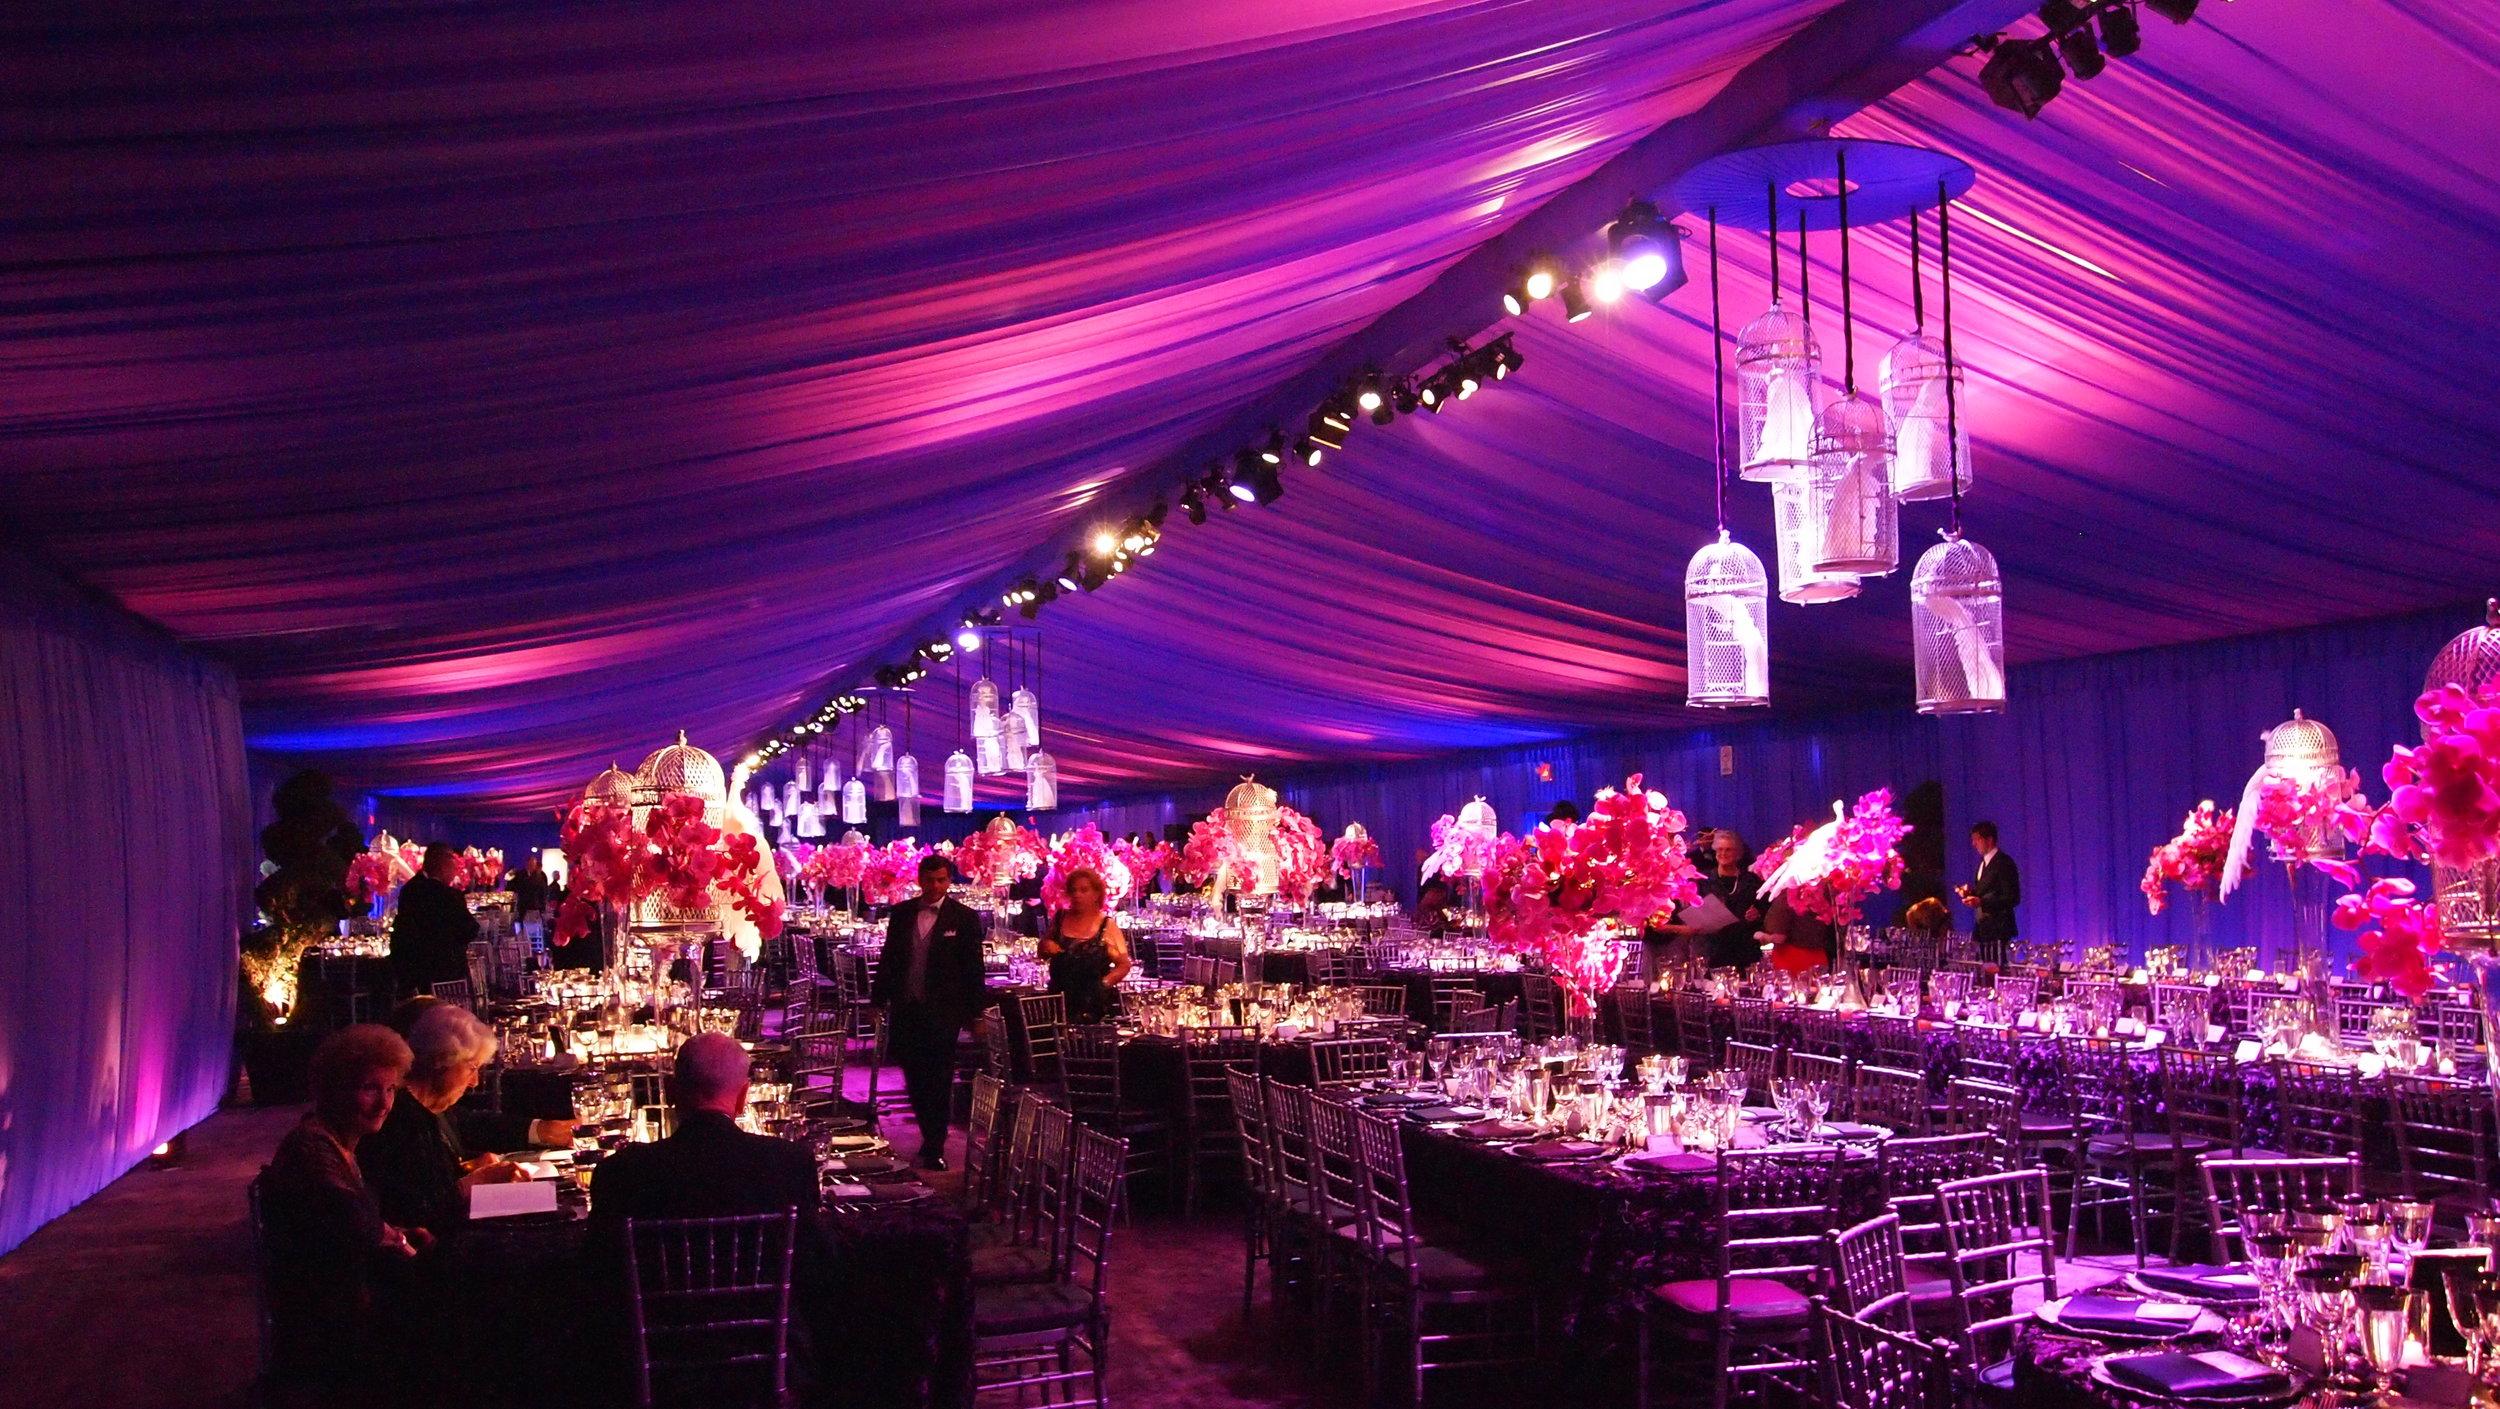 SF SymphonyOpening Night Gala  Robert Fountain Designs